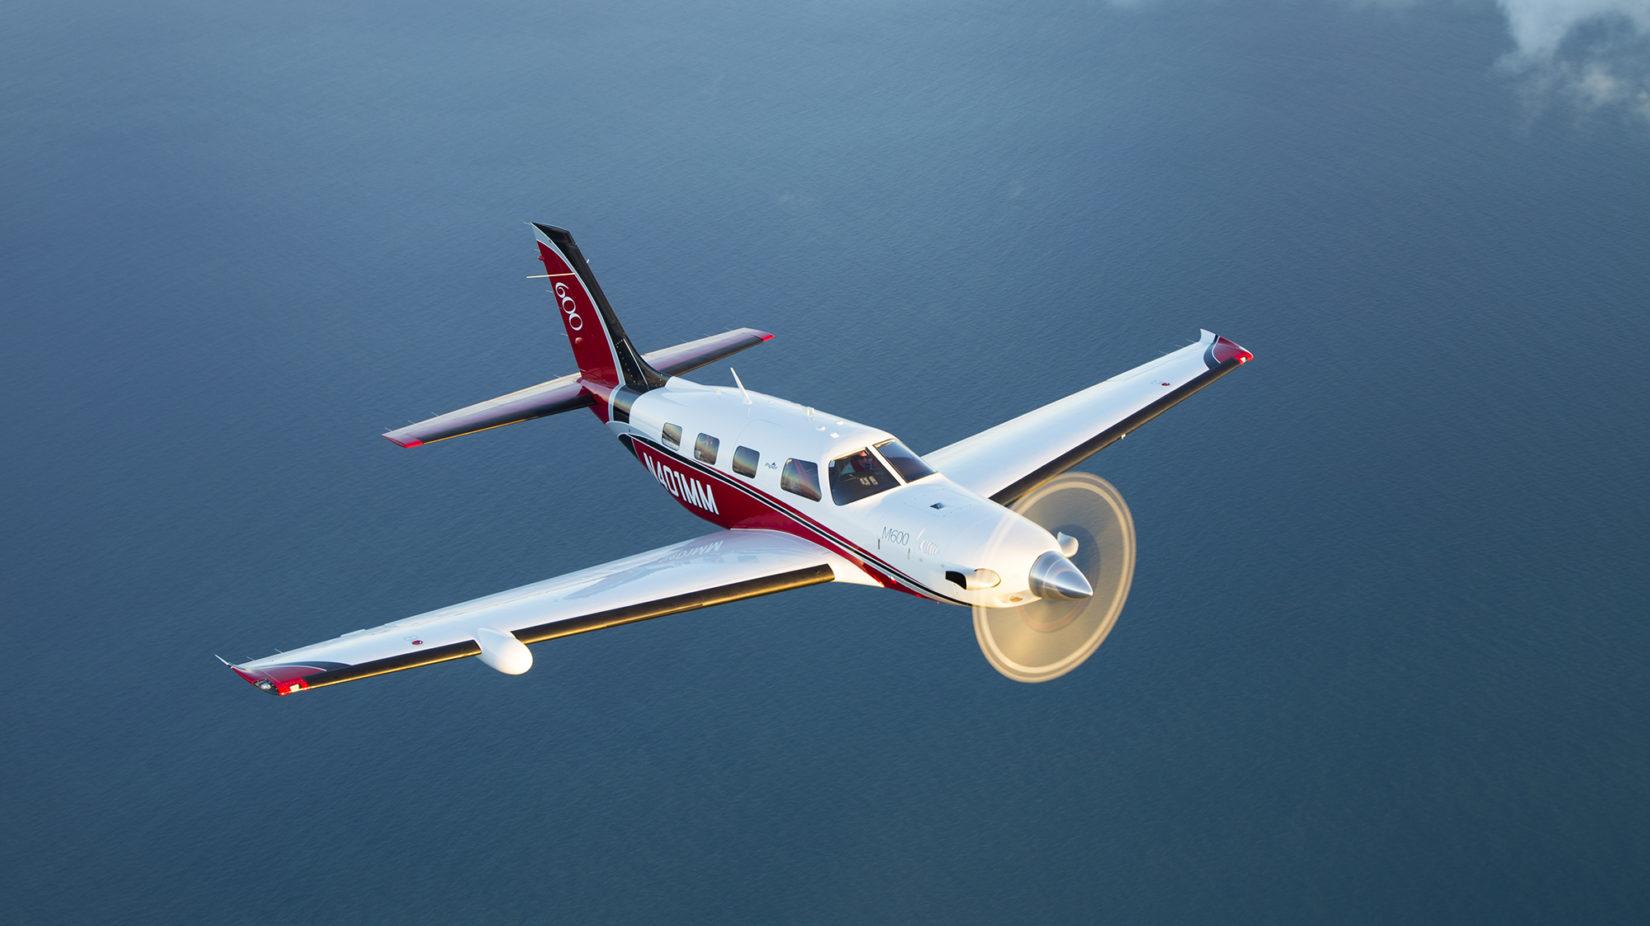 M600 flying over the ocean